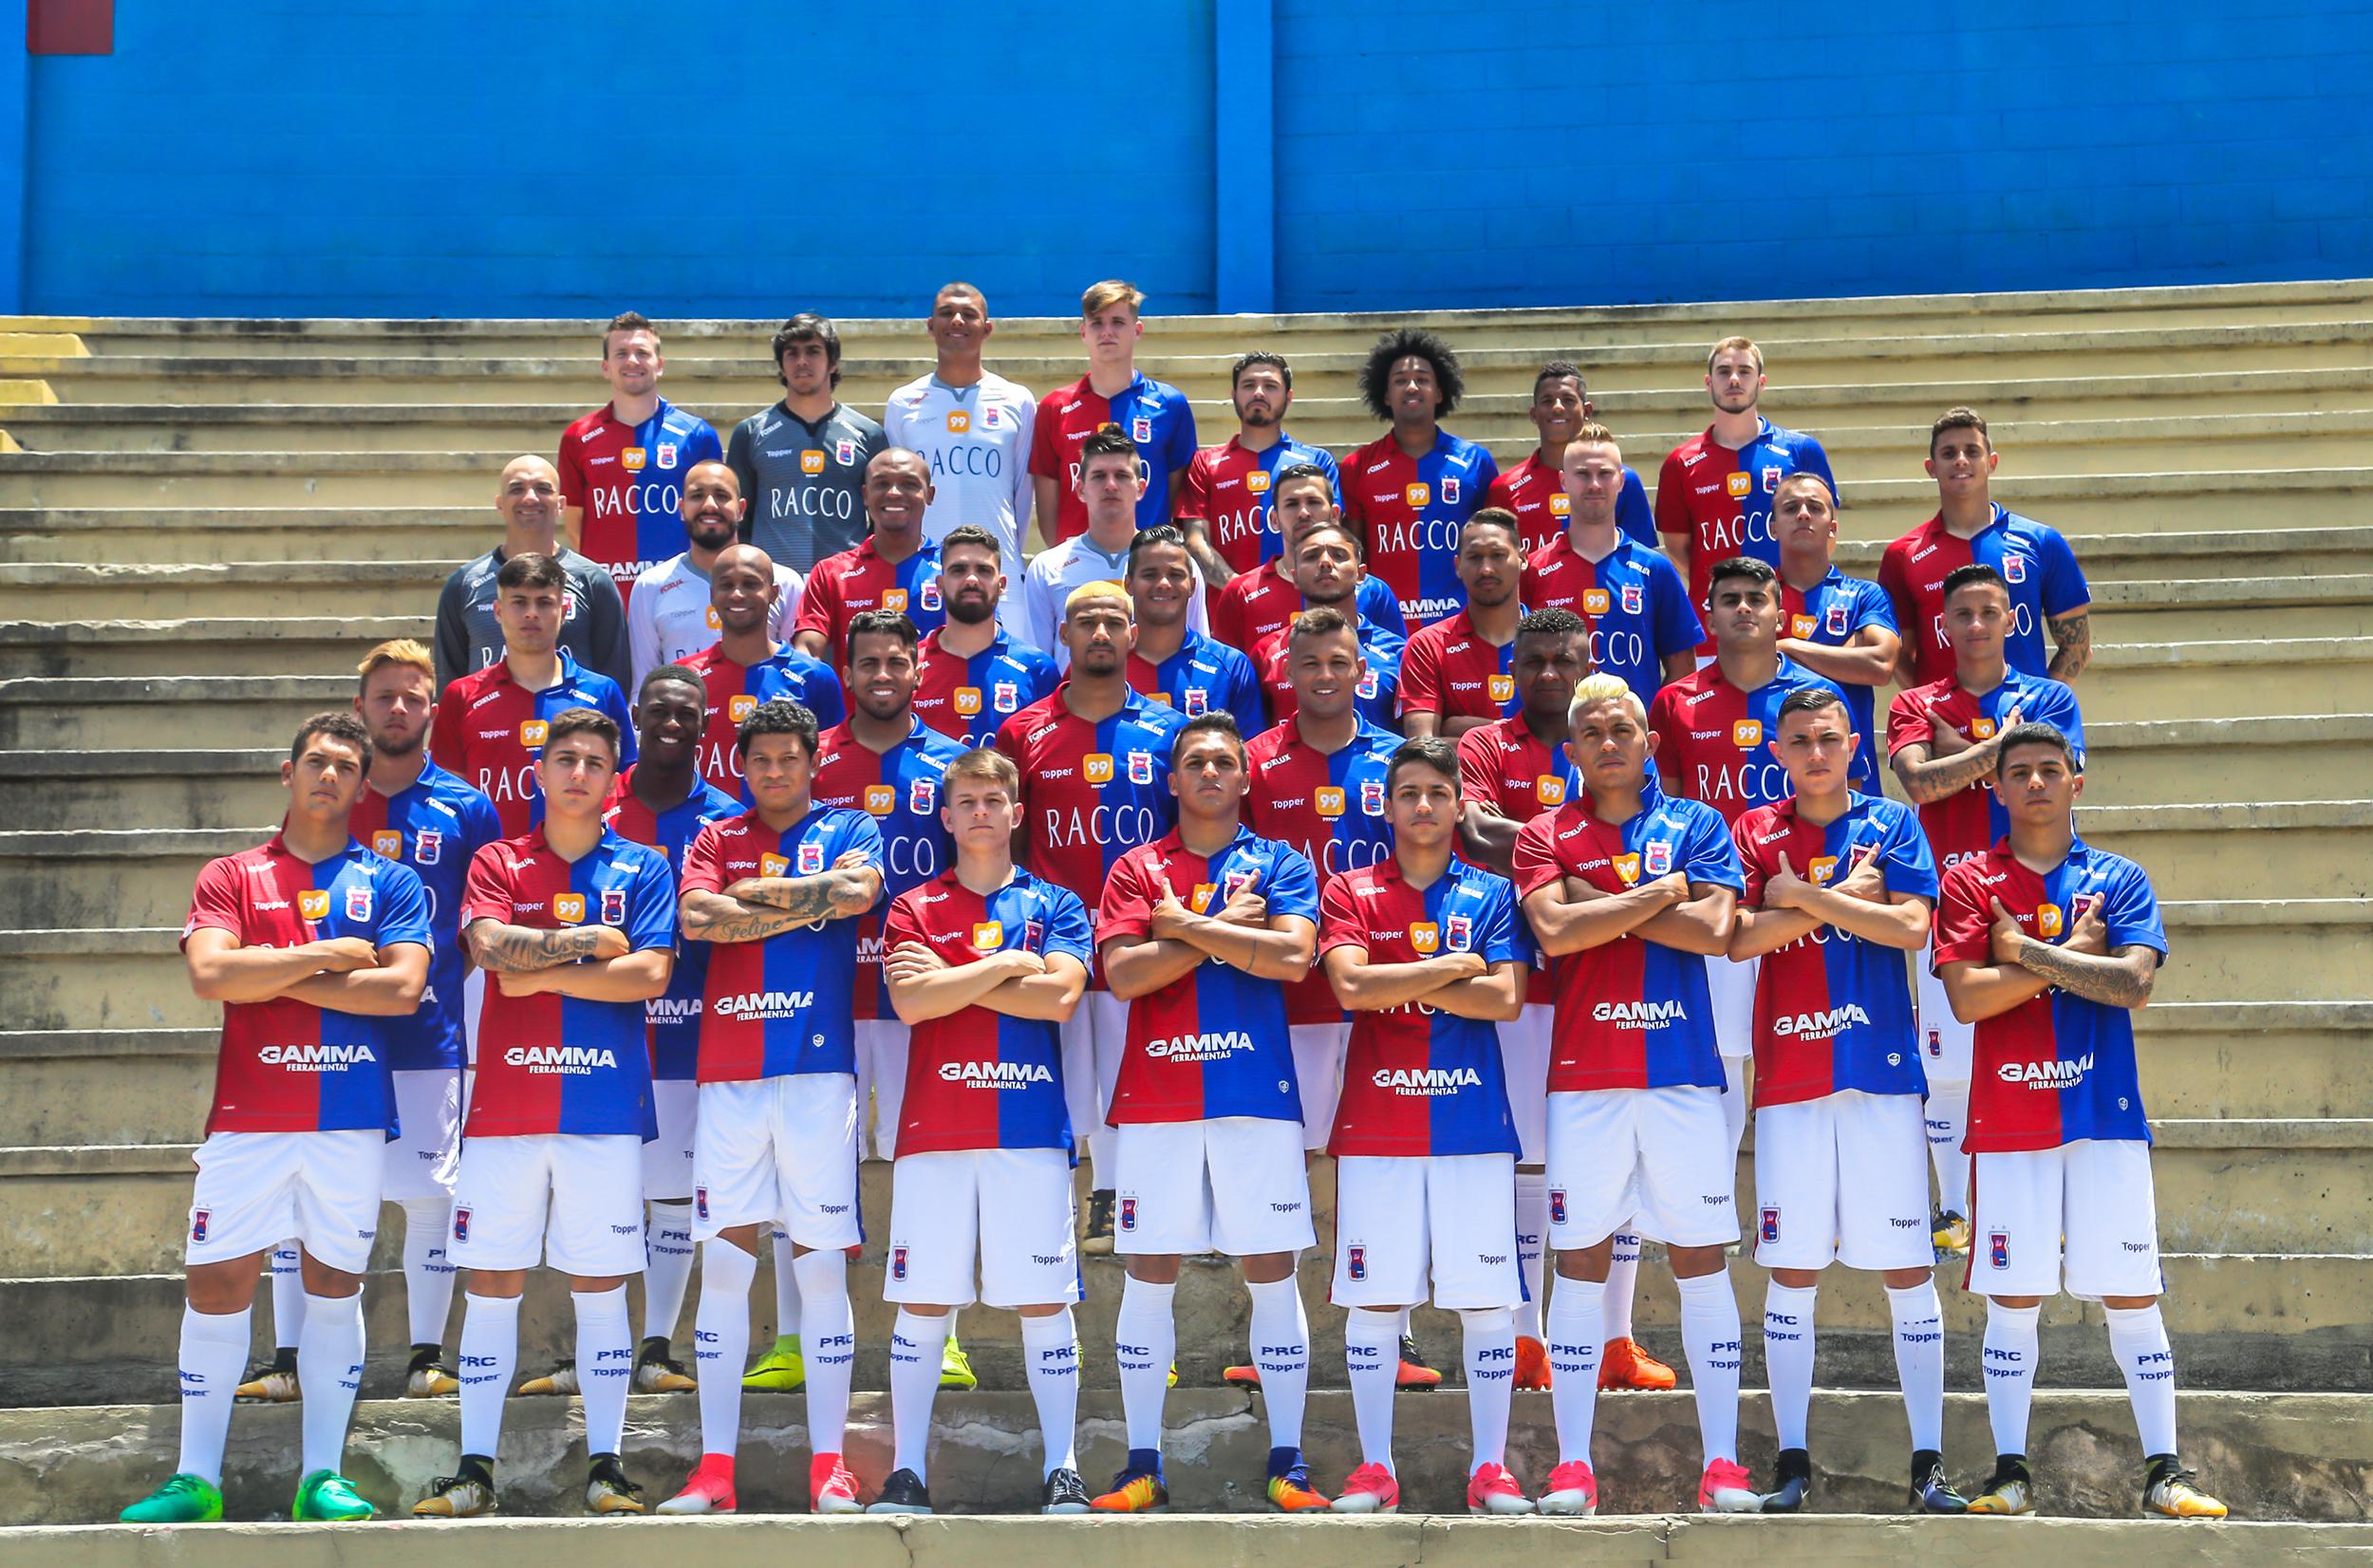 Patrocínio no Futebol 2017